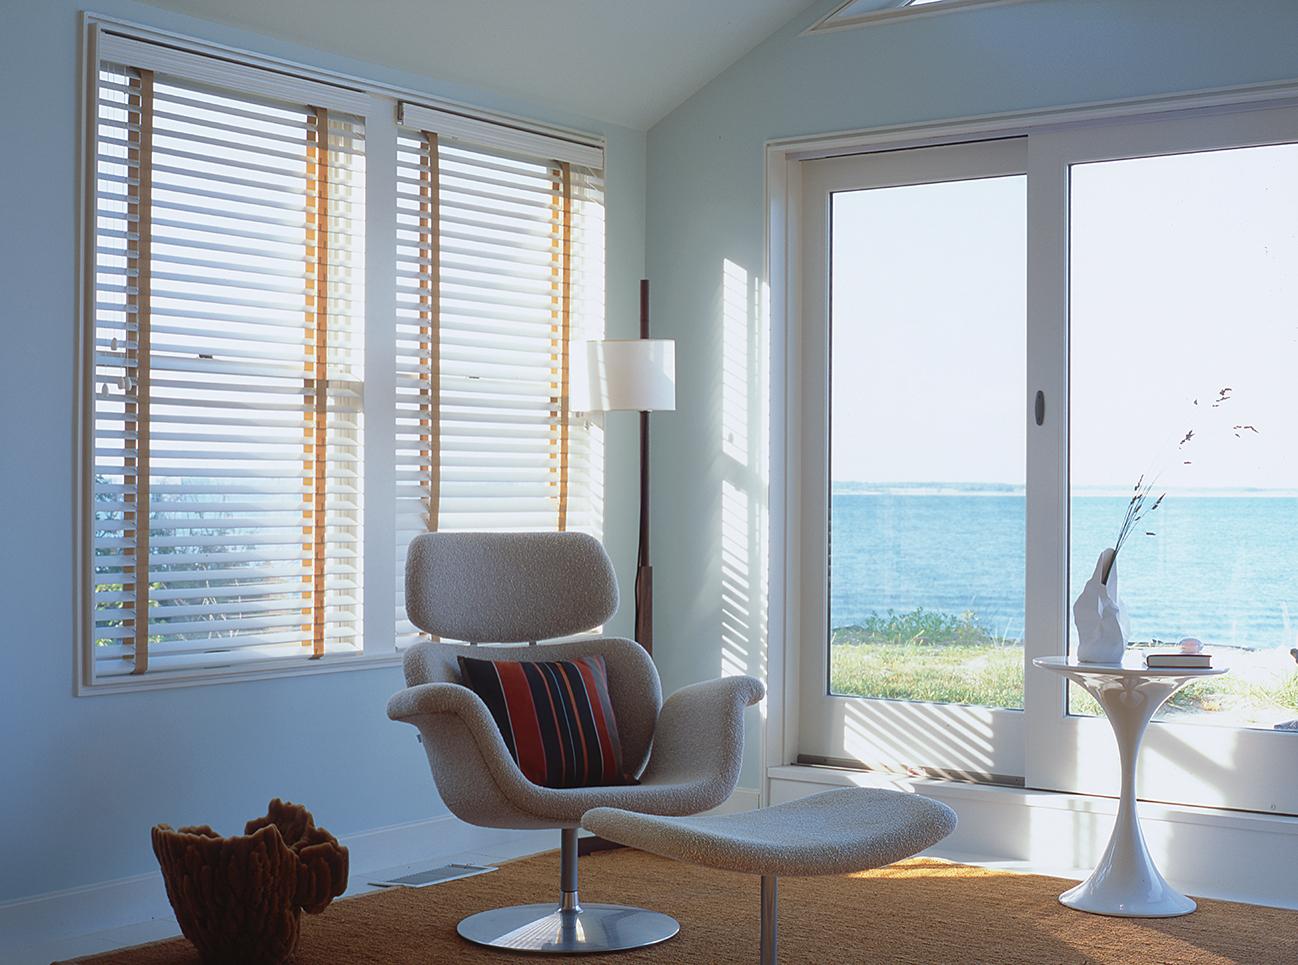 luis-pons-design-interior-house-East-Hampton-NY_7.jpg